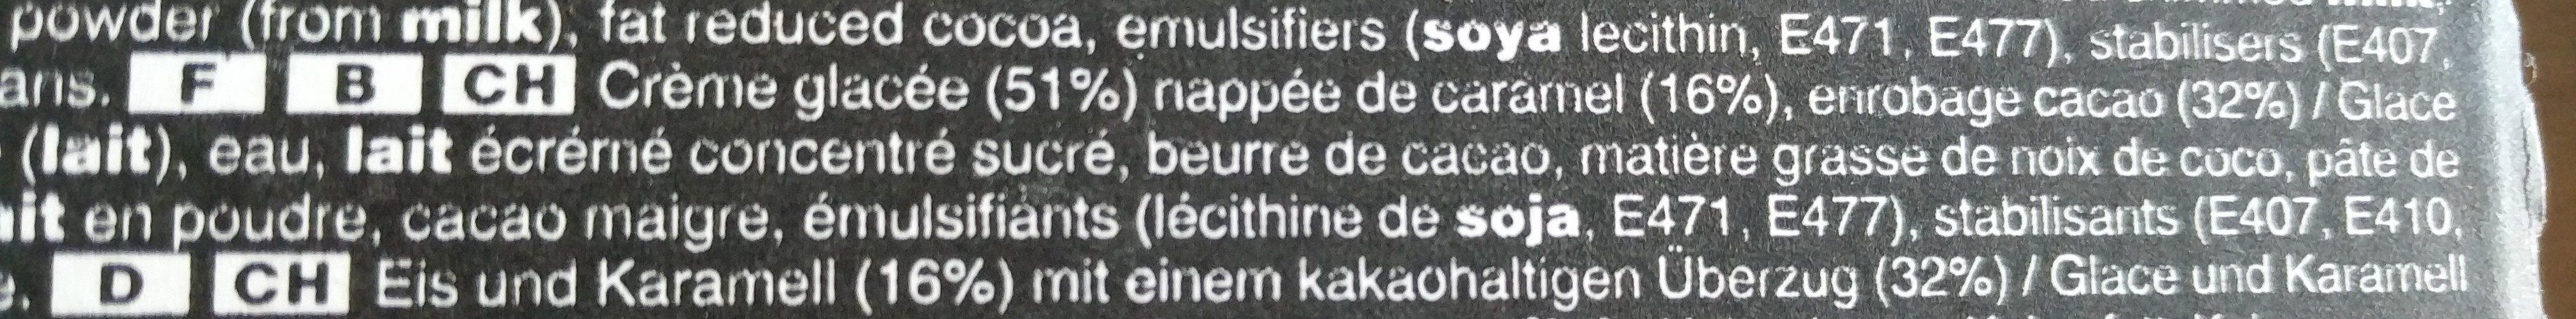 Mars Eiscreme - Ingrédients - fr